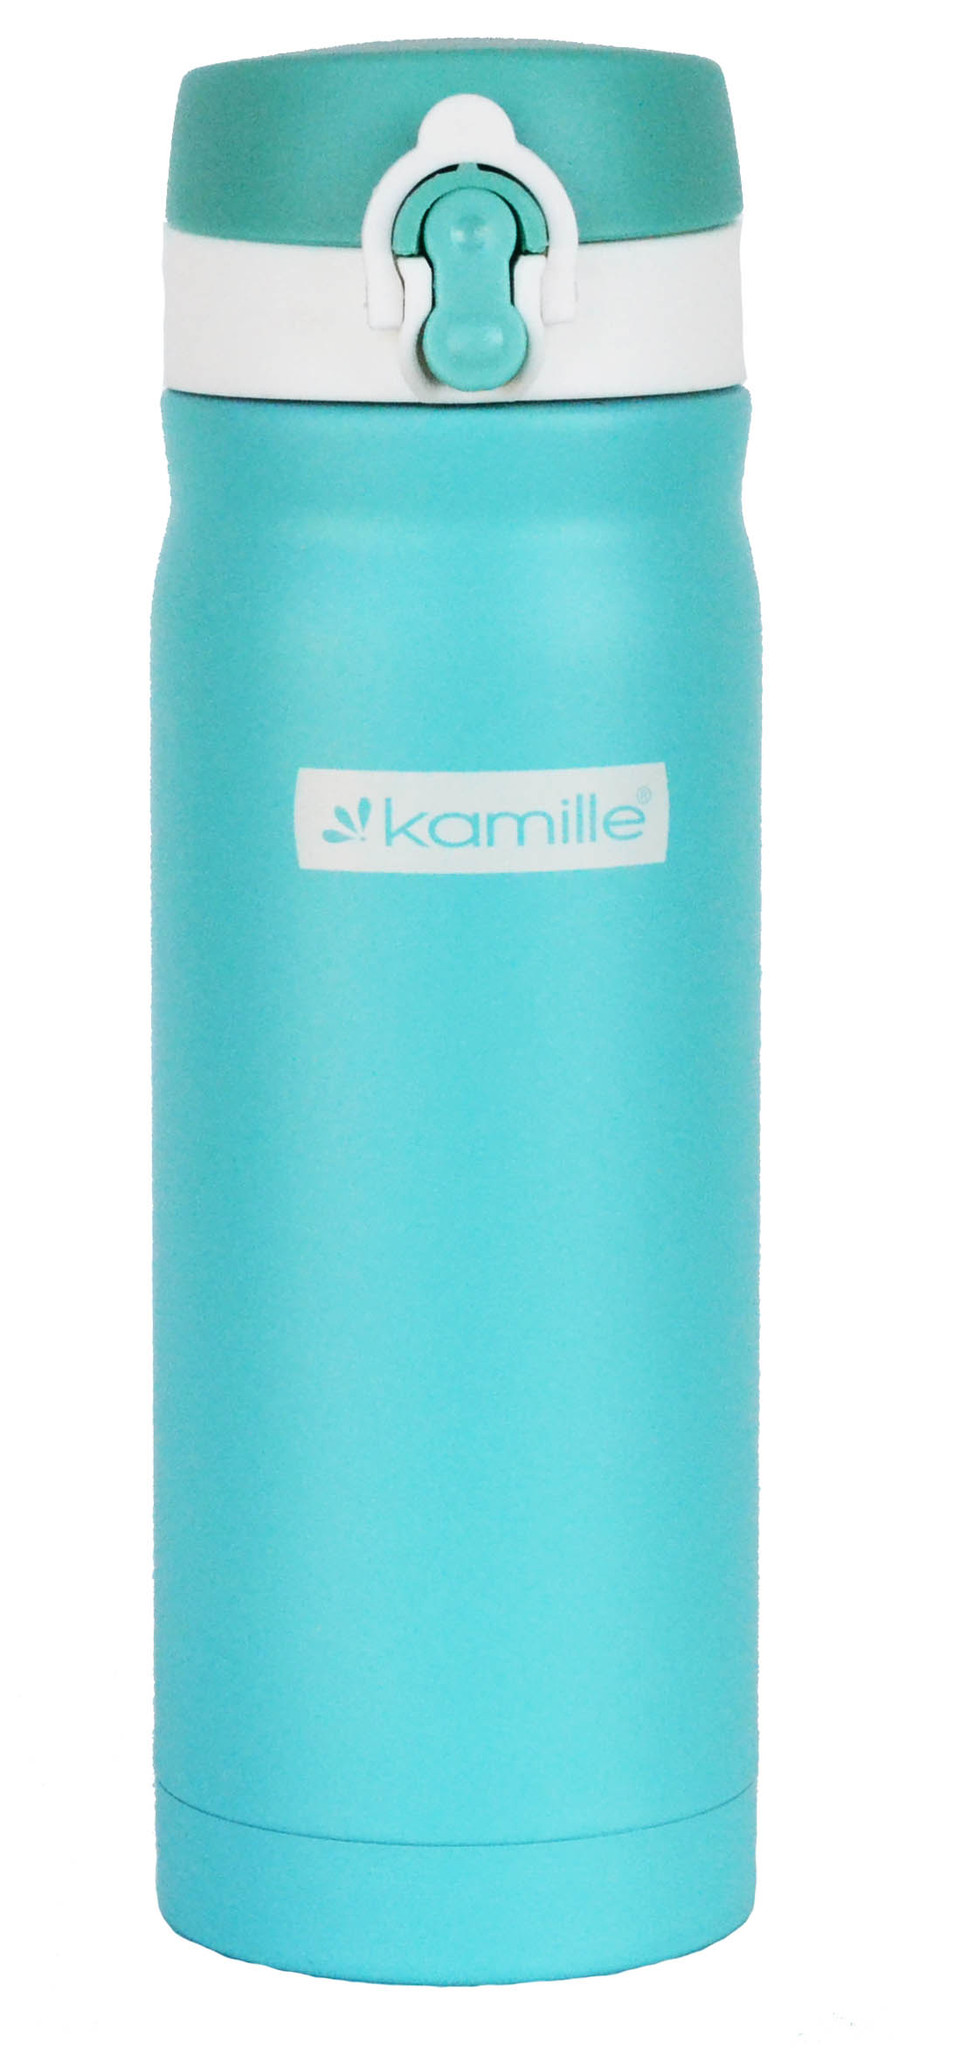 Термос-кружка Kamille 450 мл. голубой